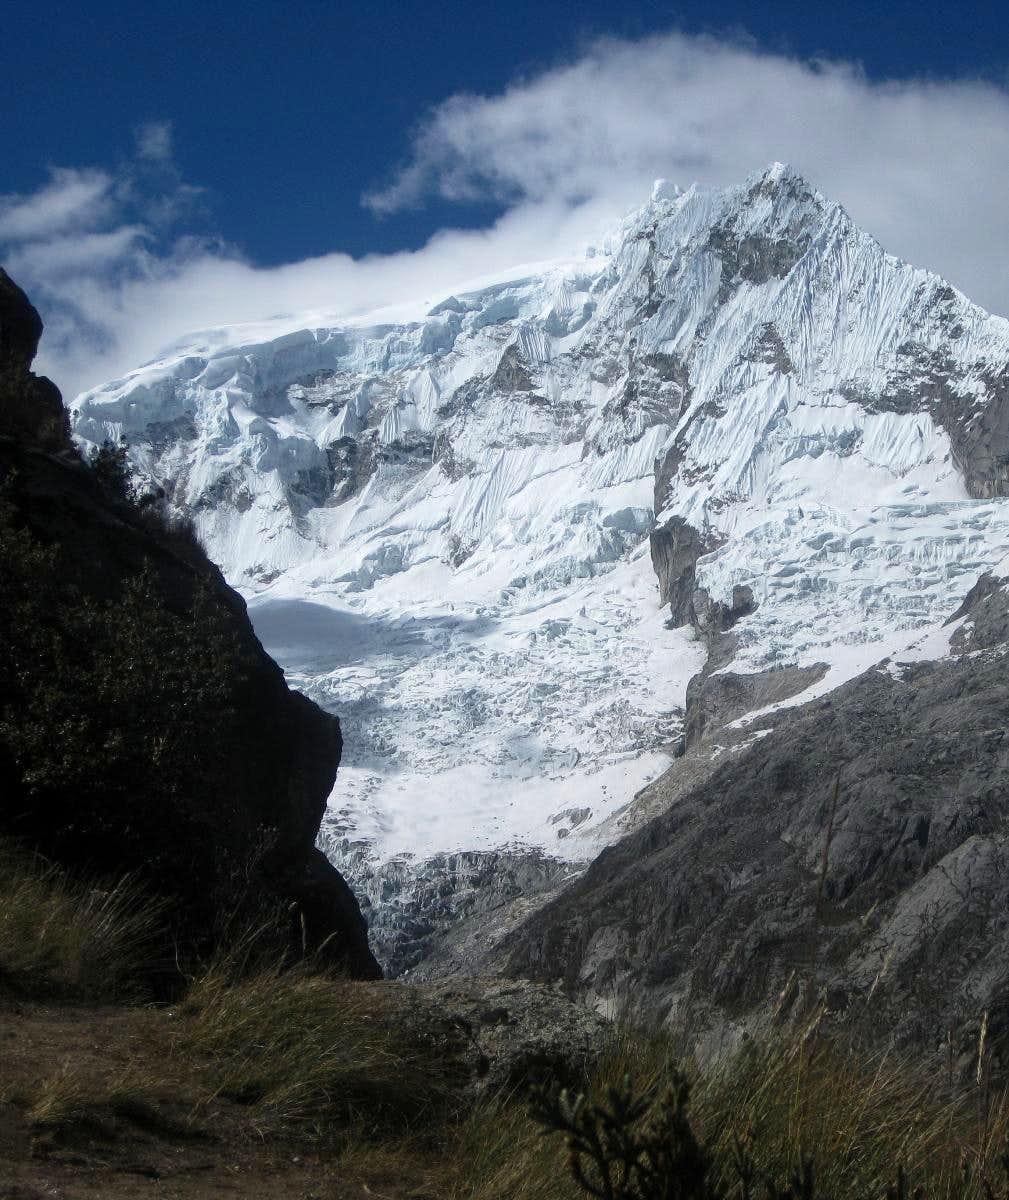 Ranrapalca from the trail to Vallunaraju